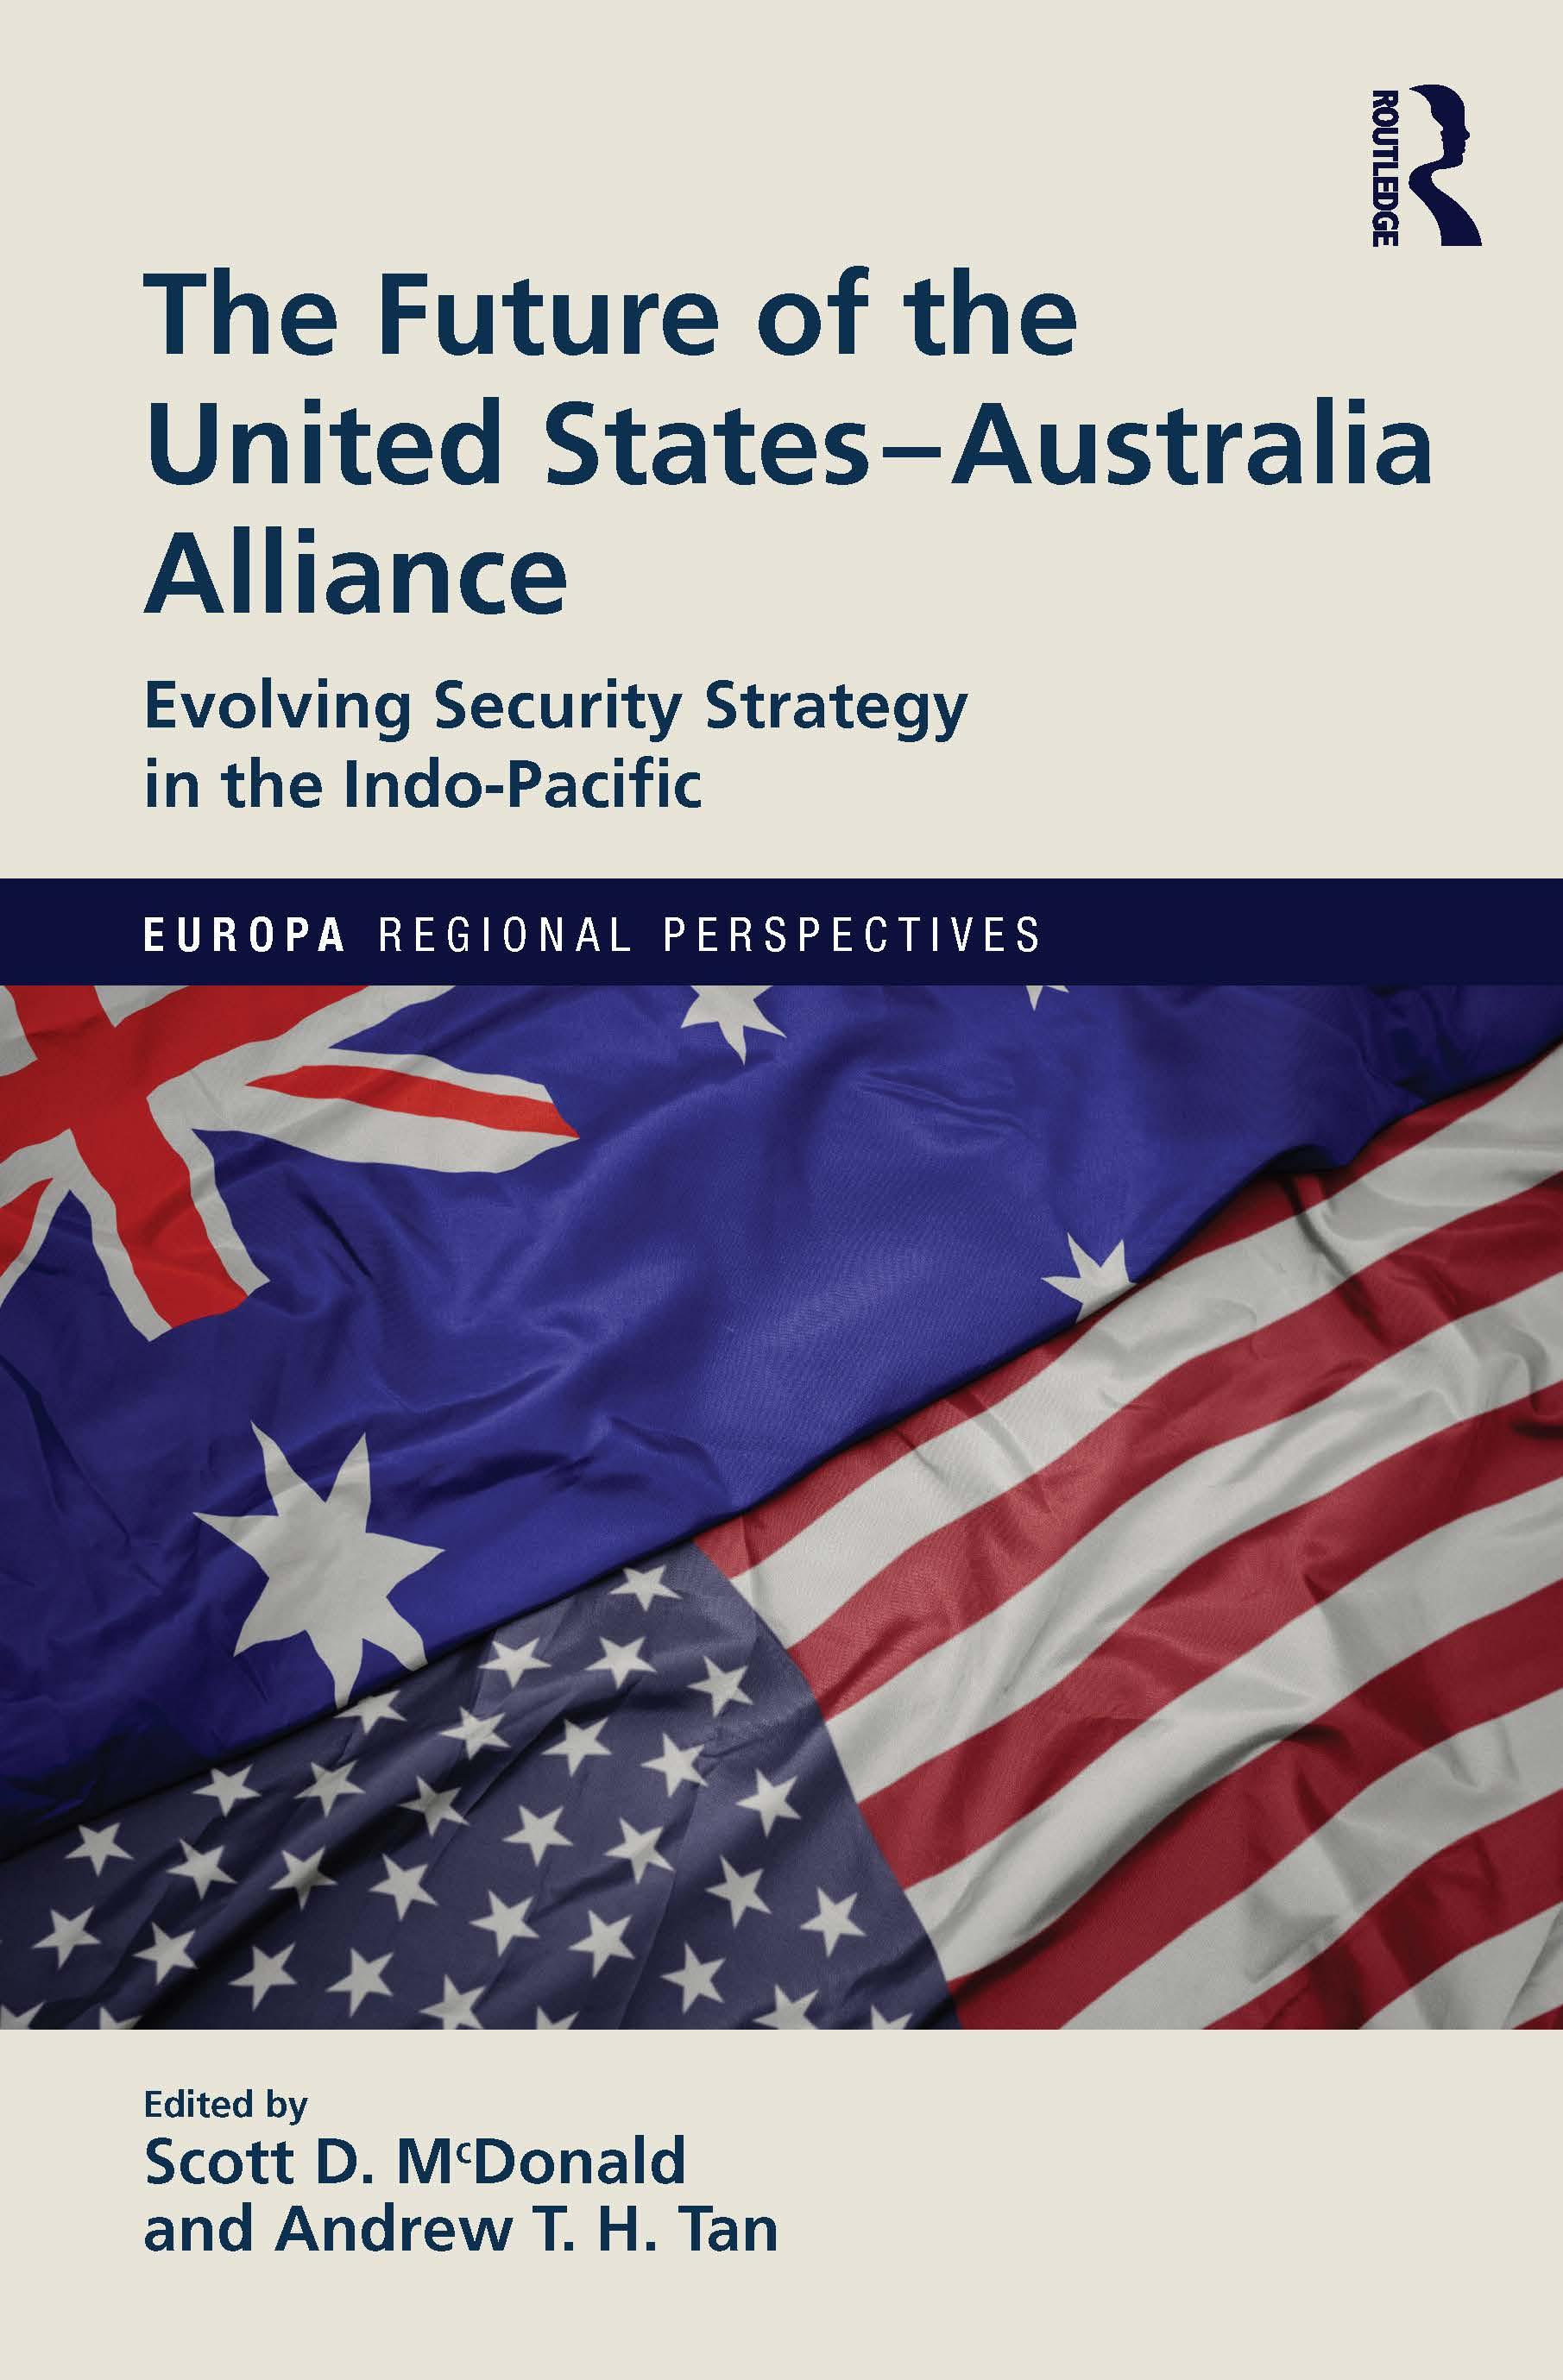 The strategic environment of the US—Australia alliance in the Indo-Pacific era